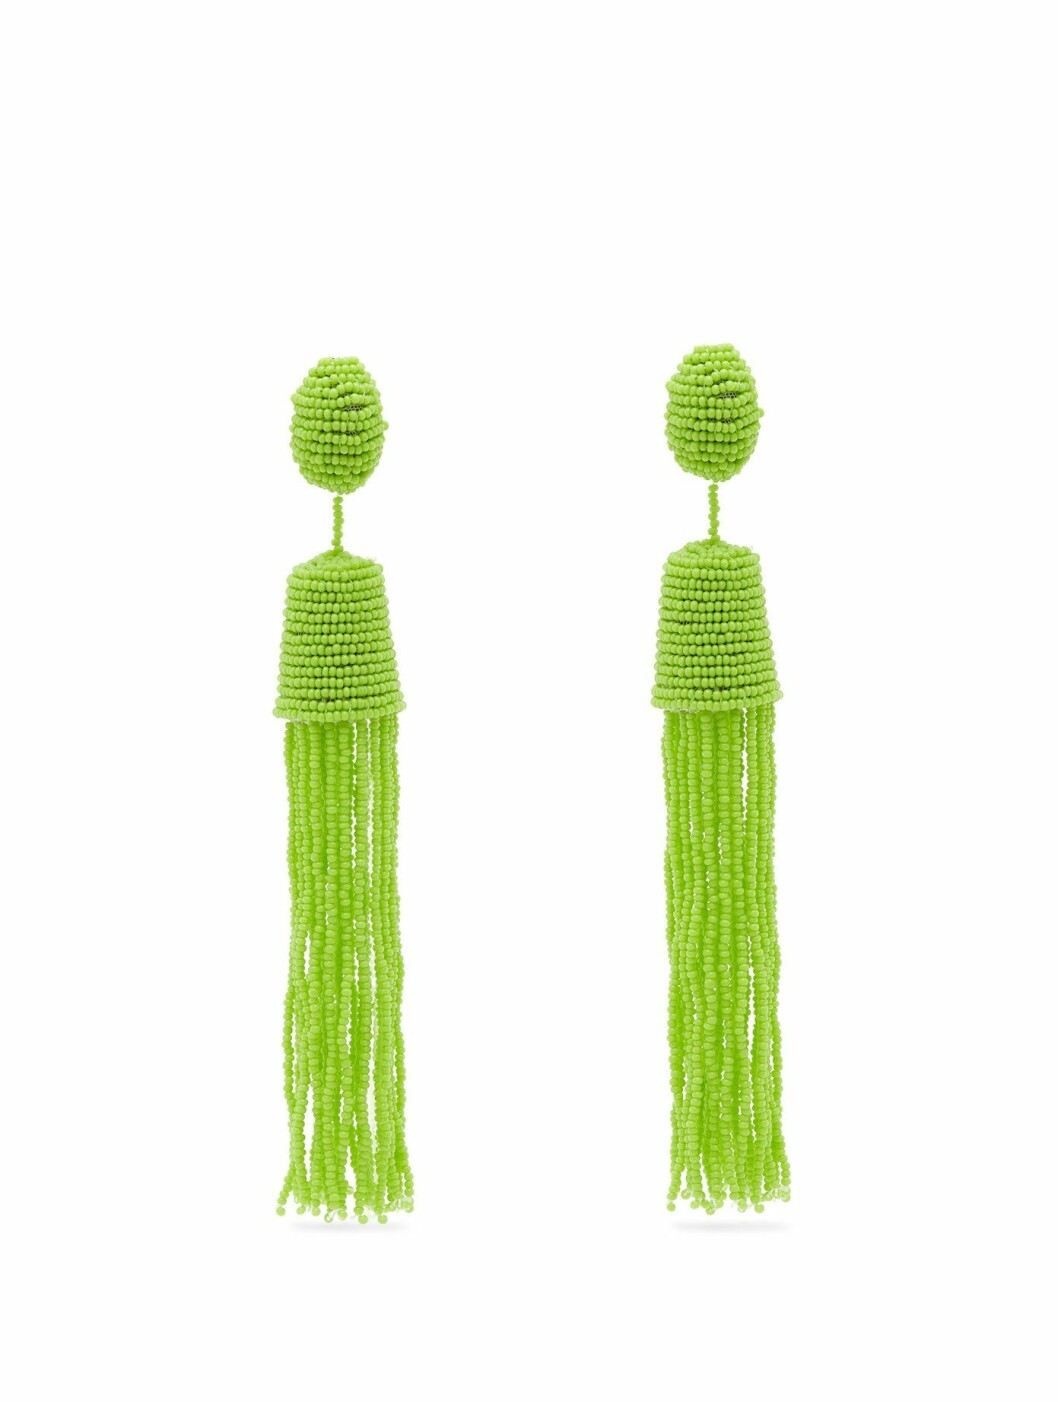 Øredobber fra Vanda Jacintho |910,-| https://www.matchesfashion.com/intl/products/Vanda-Jacintho-Bead-tassel-drop-earrings-1219138